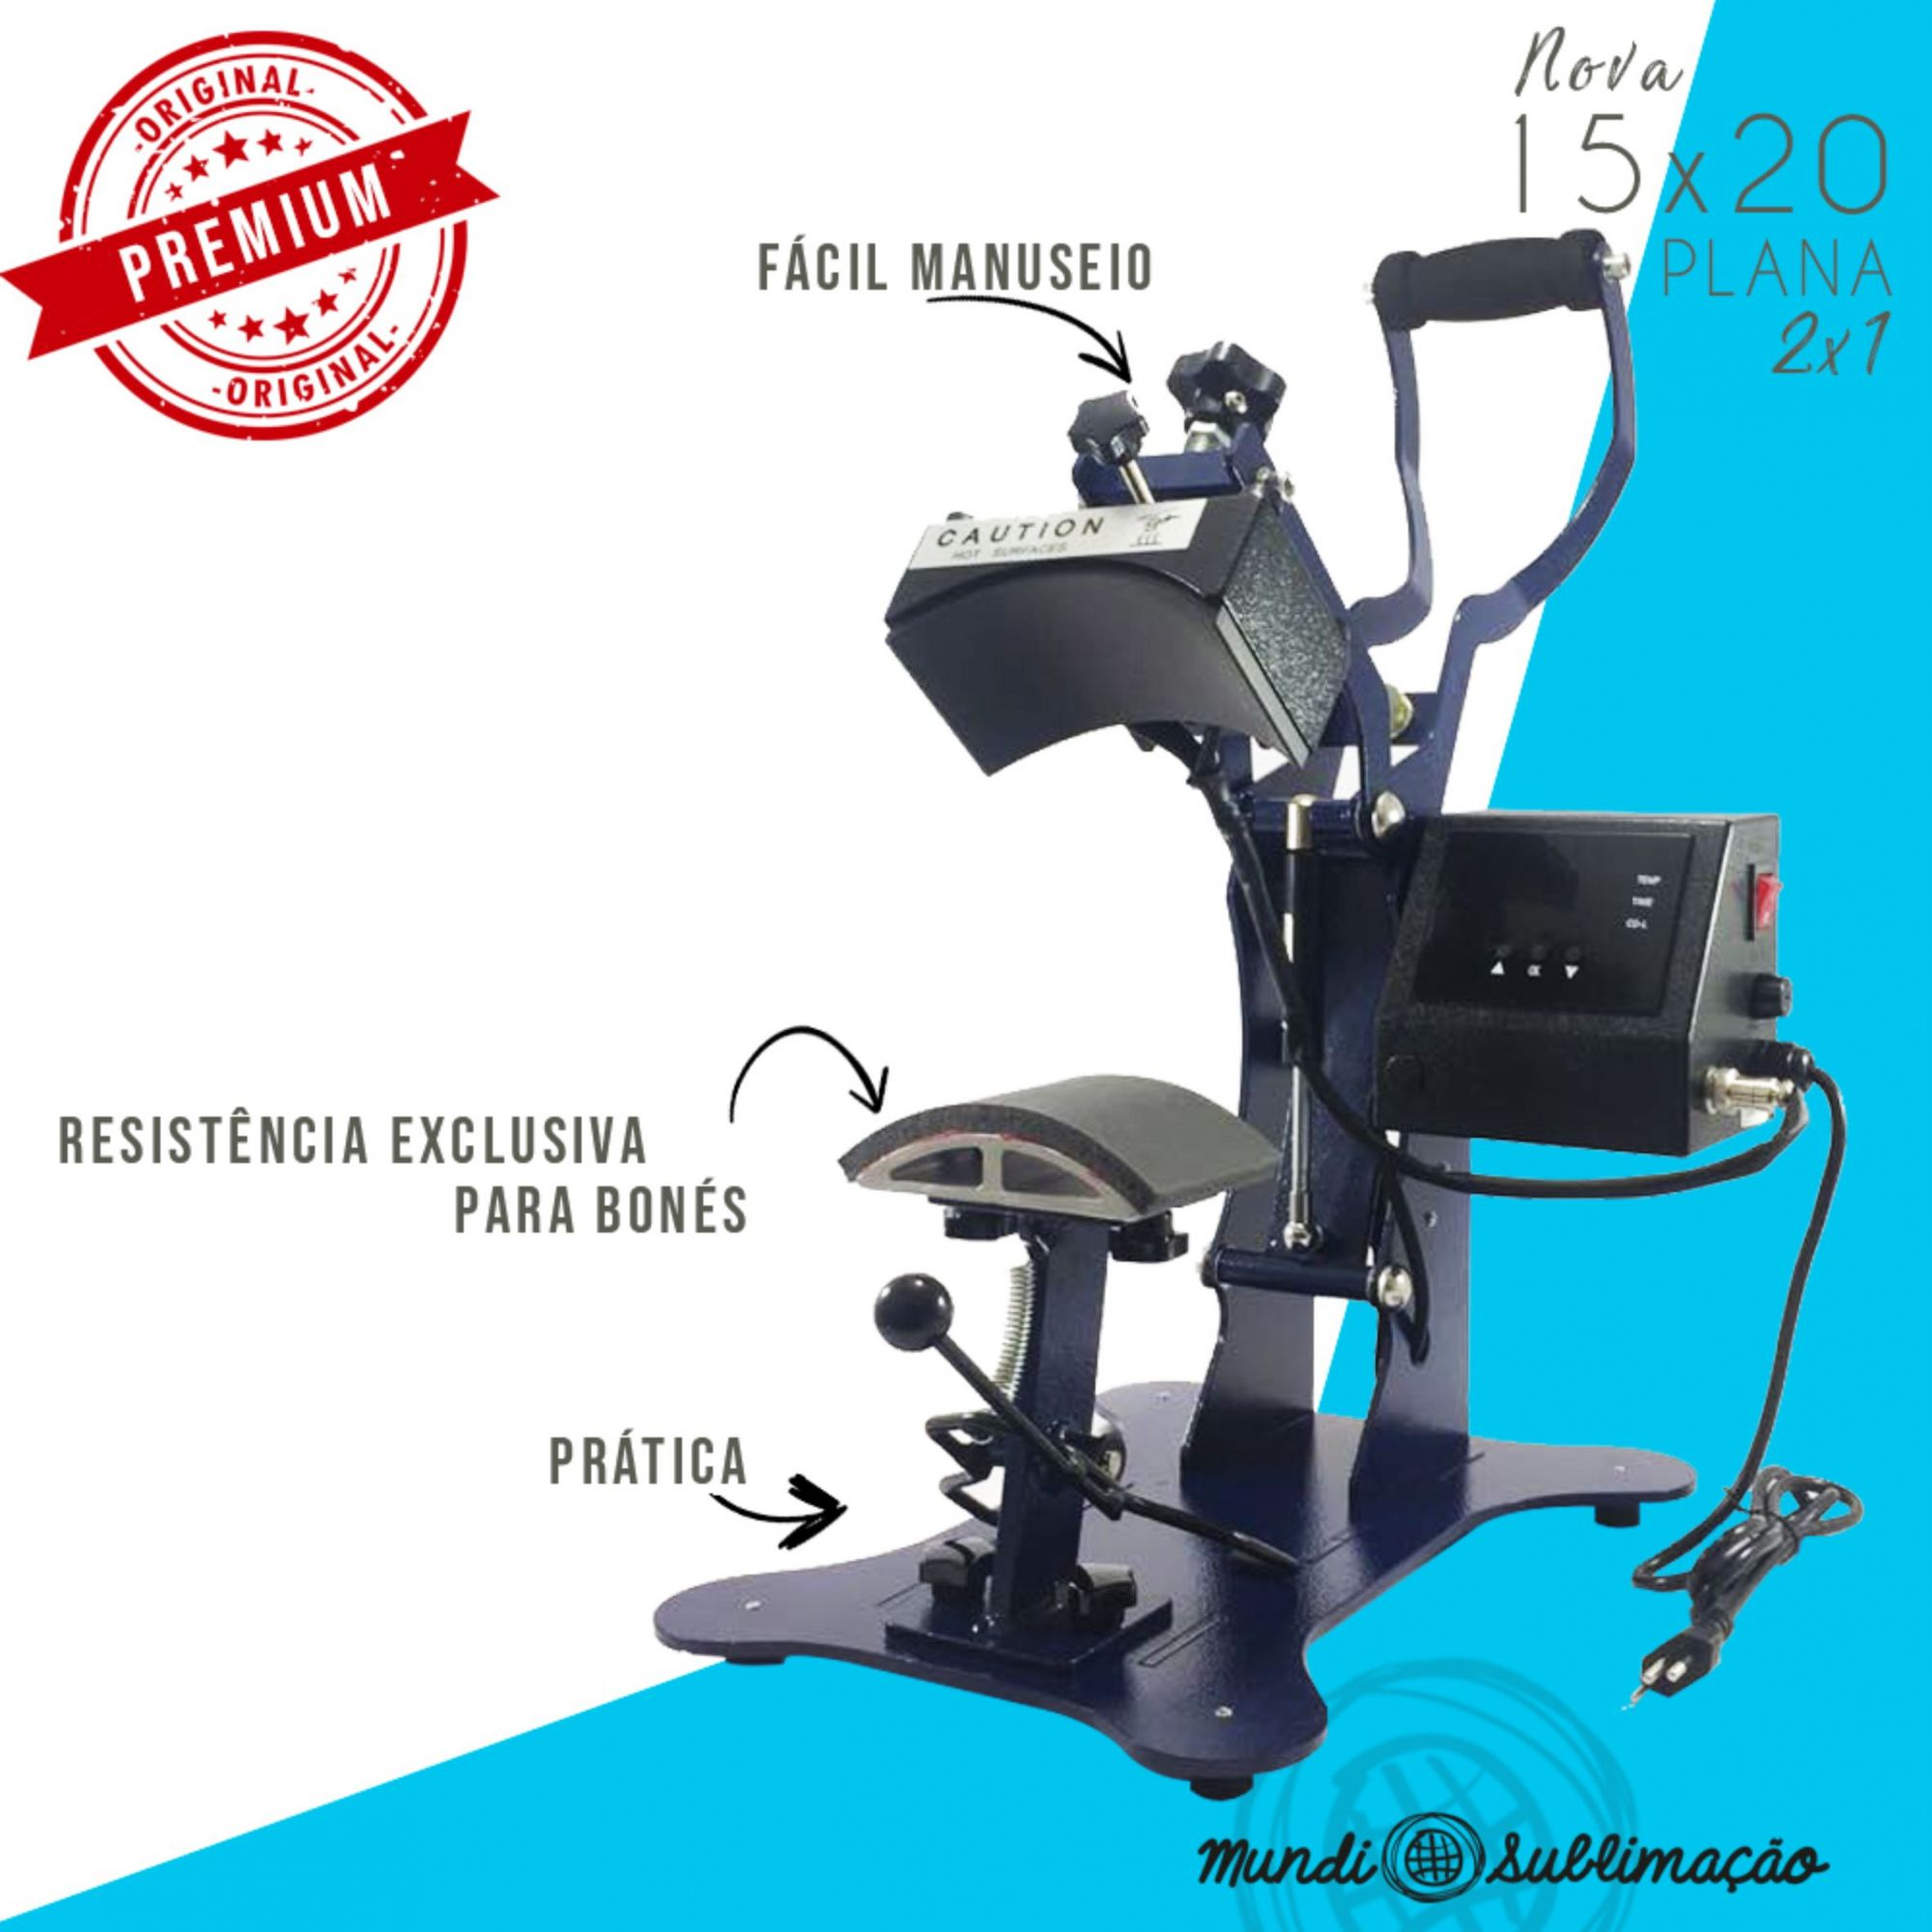 Prensa Premium Plana 15x20 2 x1